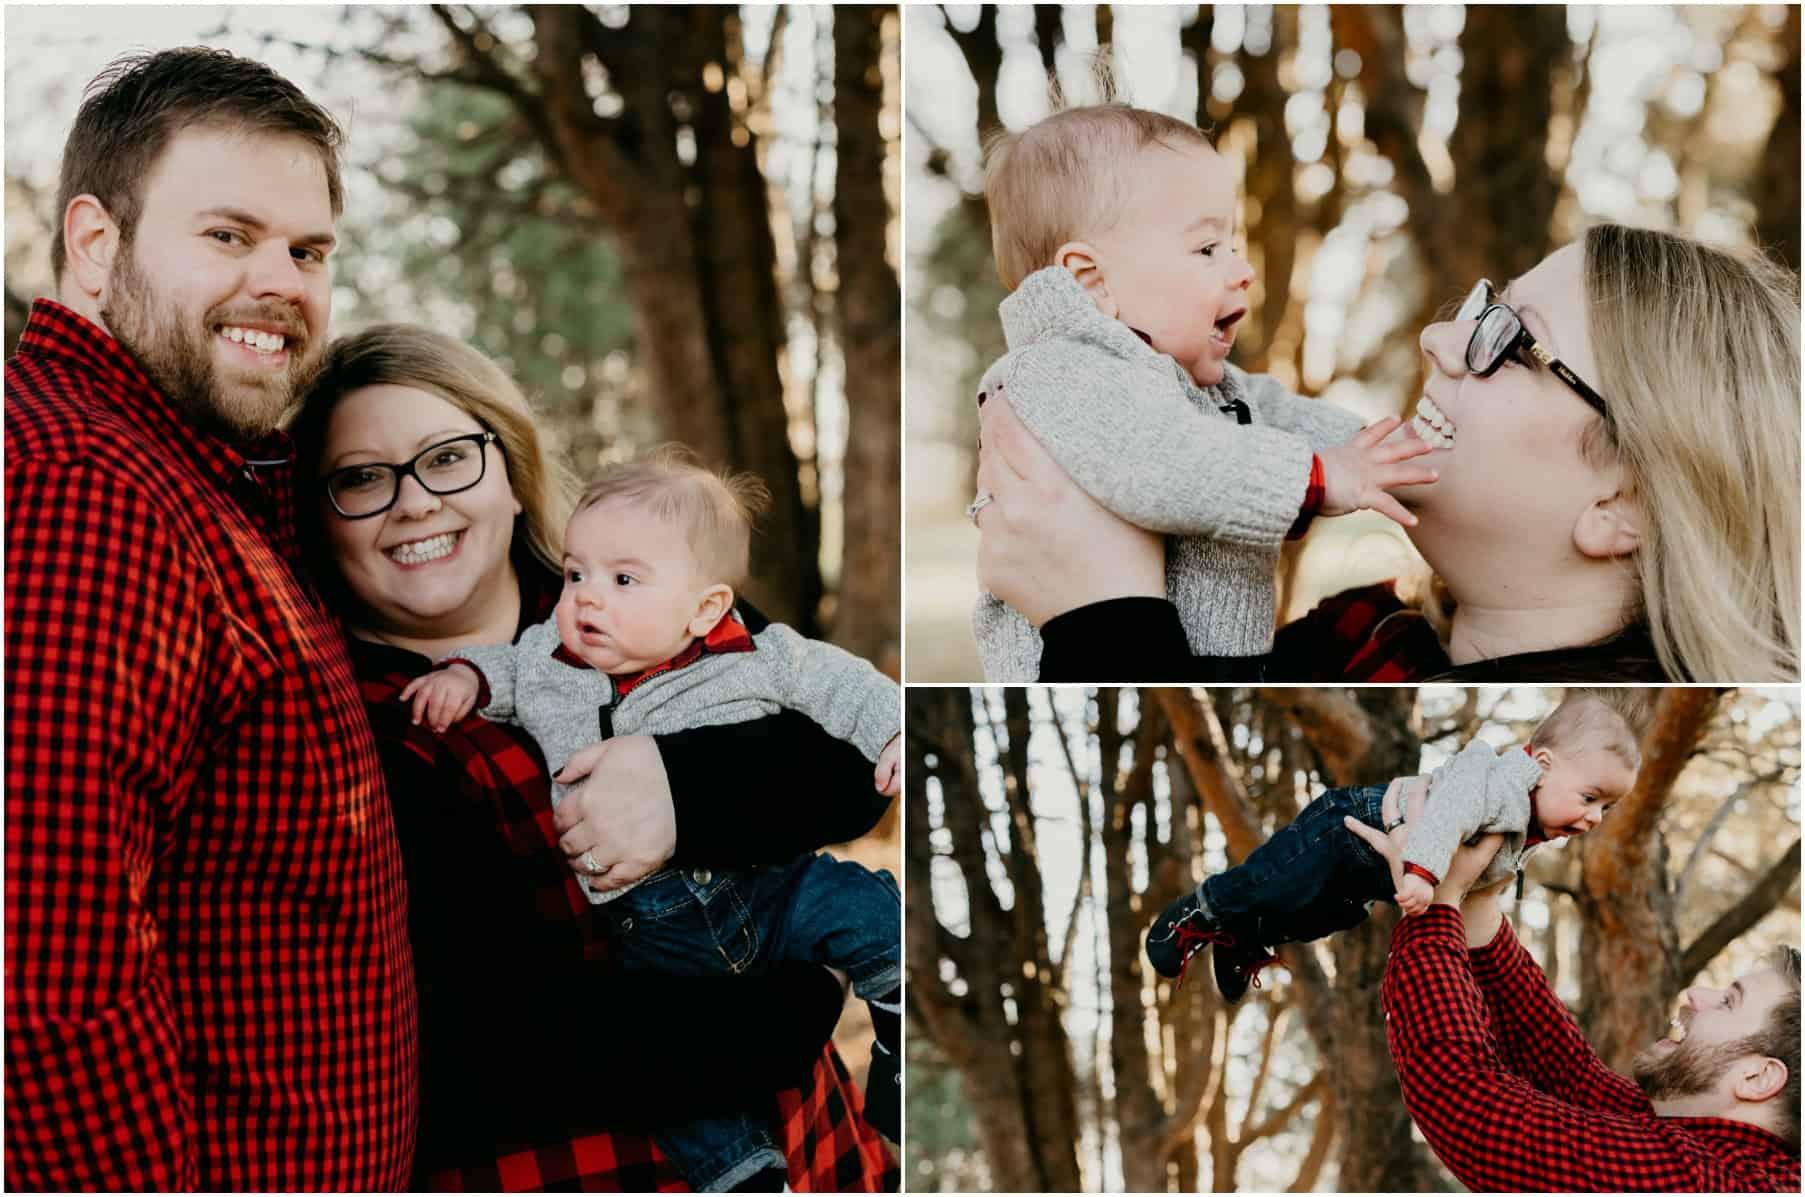 6 month baby winter photos - Philia Kelnhofer